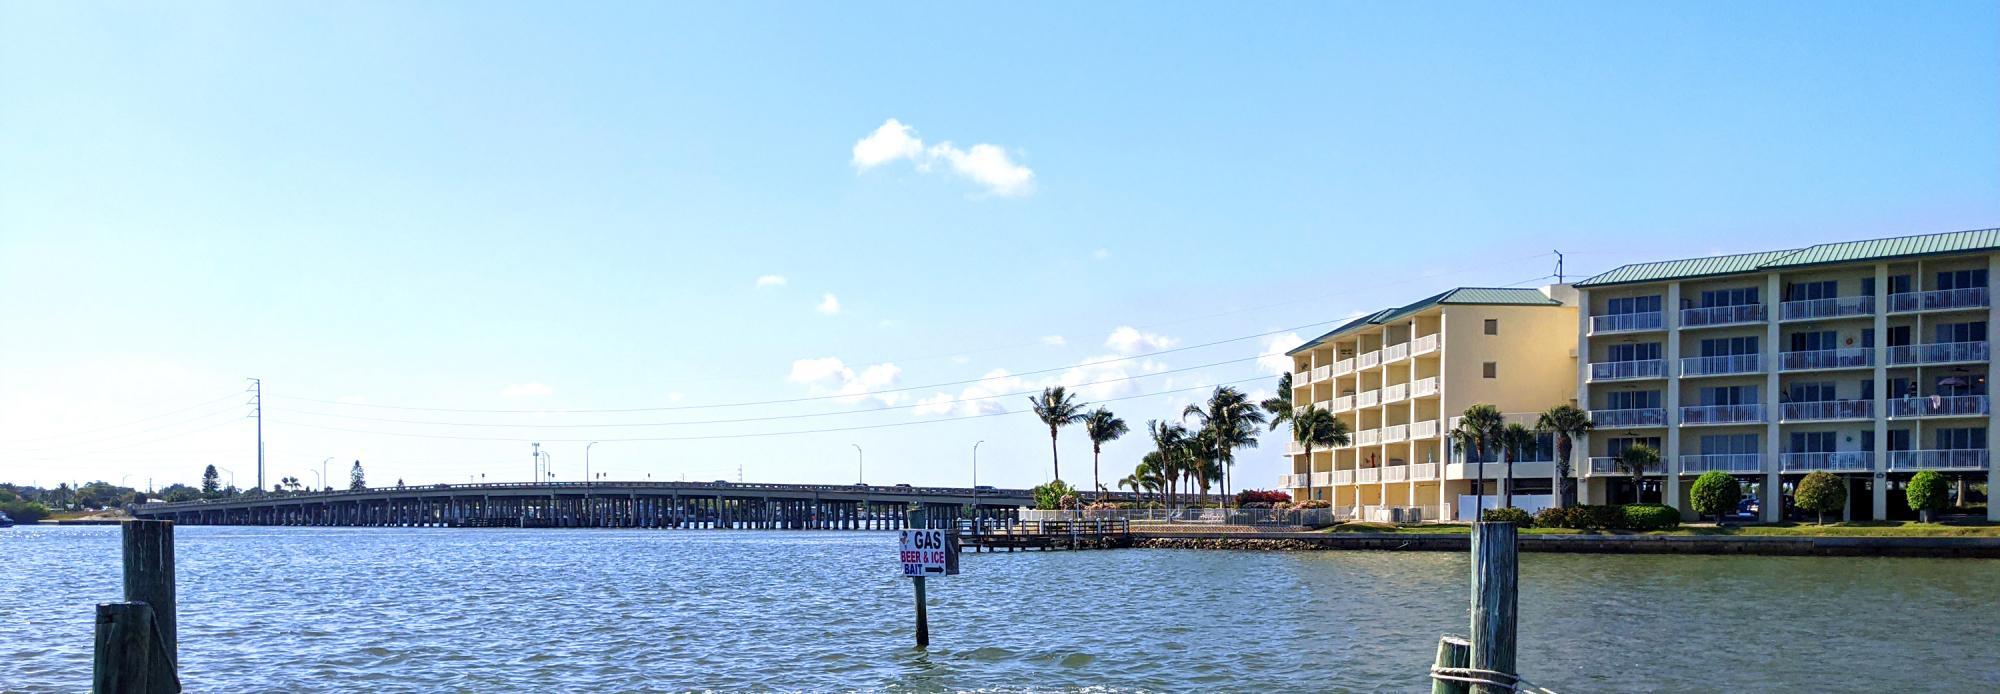 Lighthouse Point Marina - St. Petersburg, FL